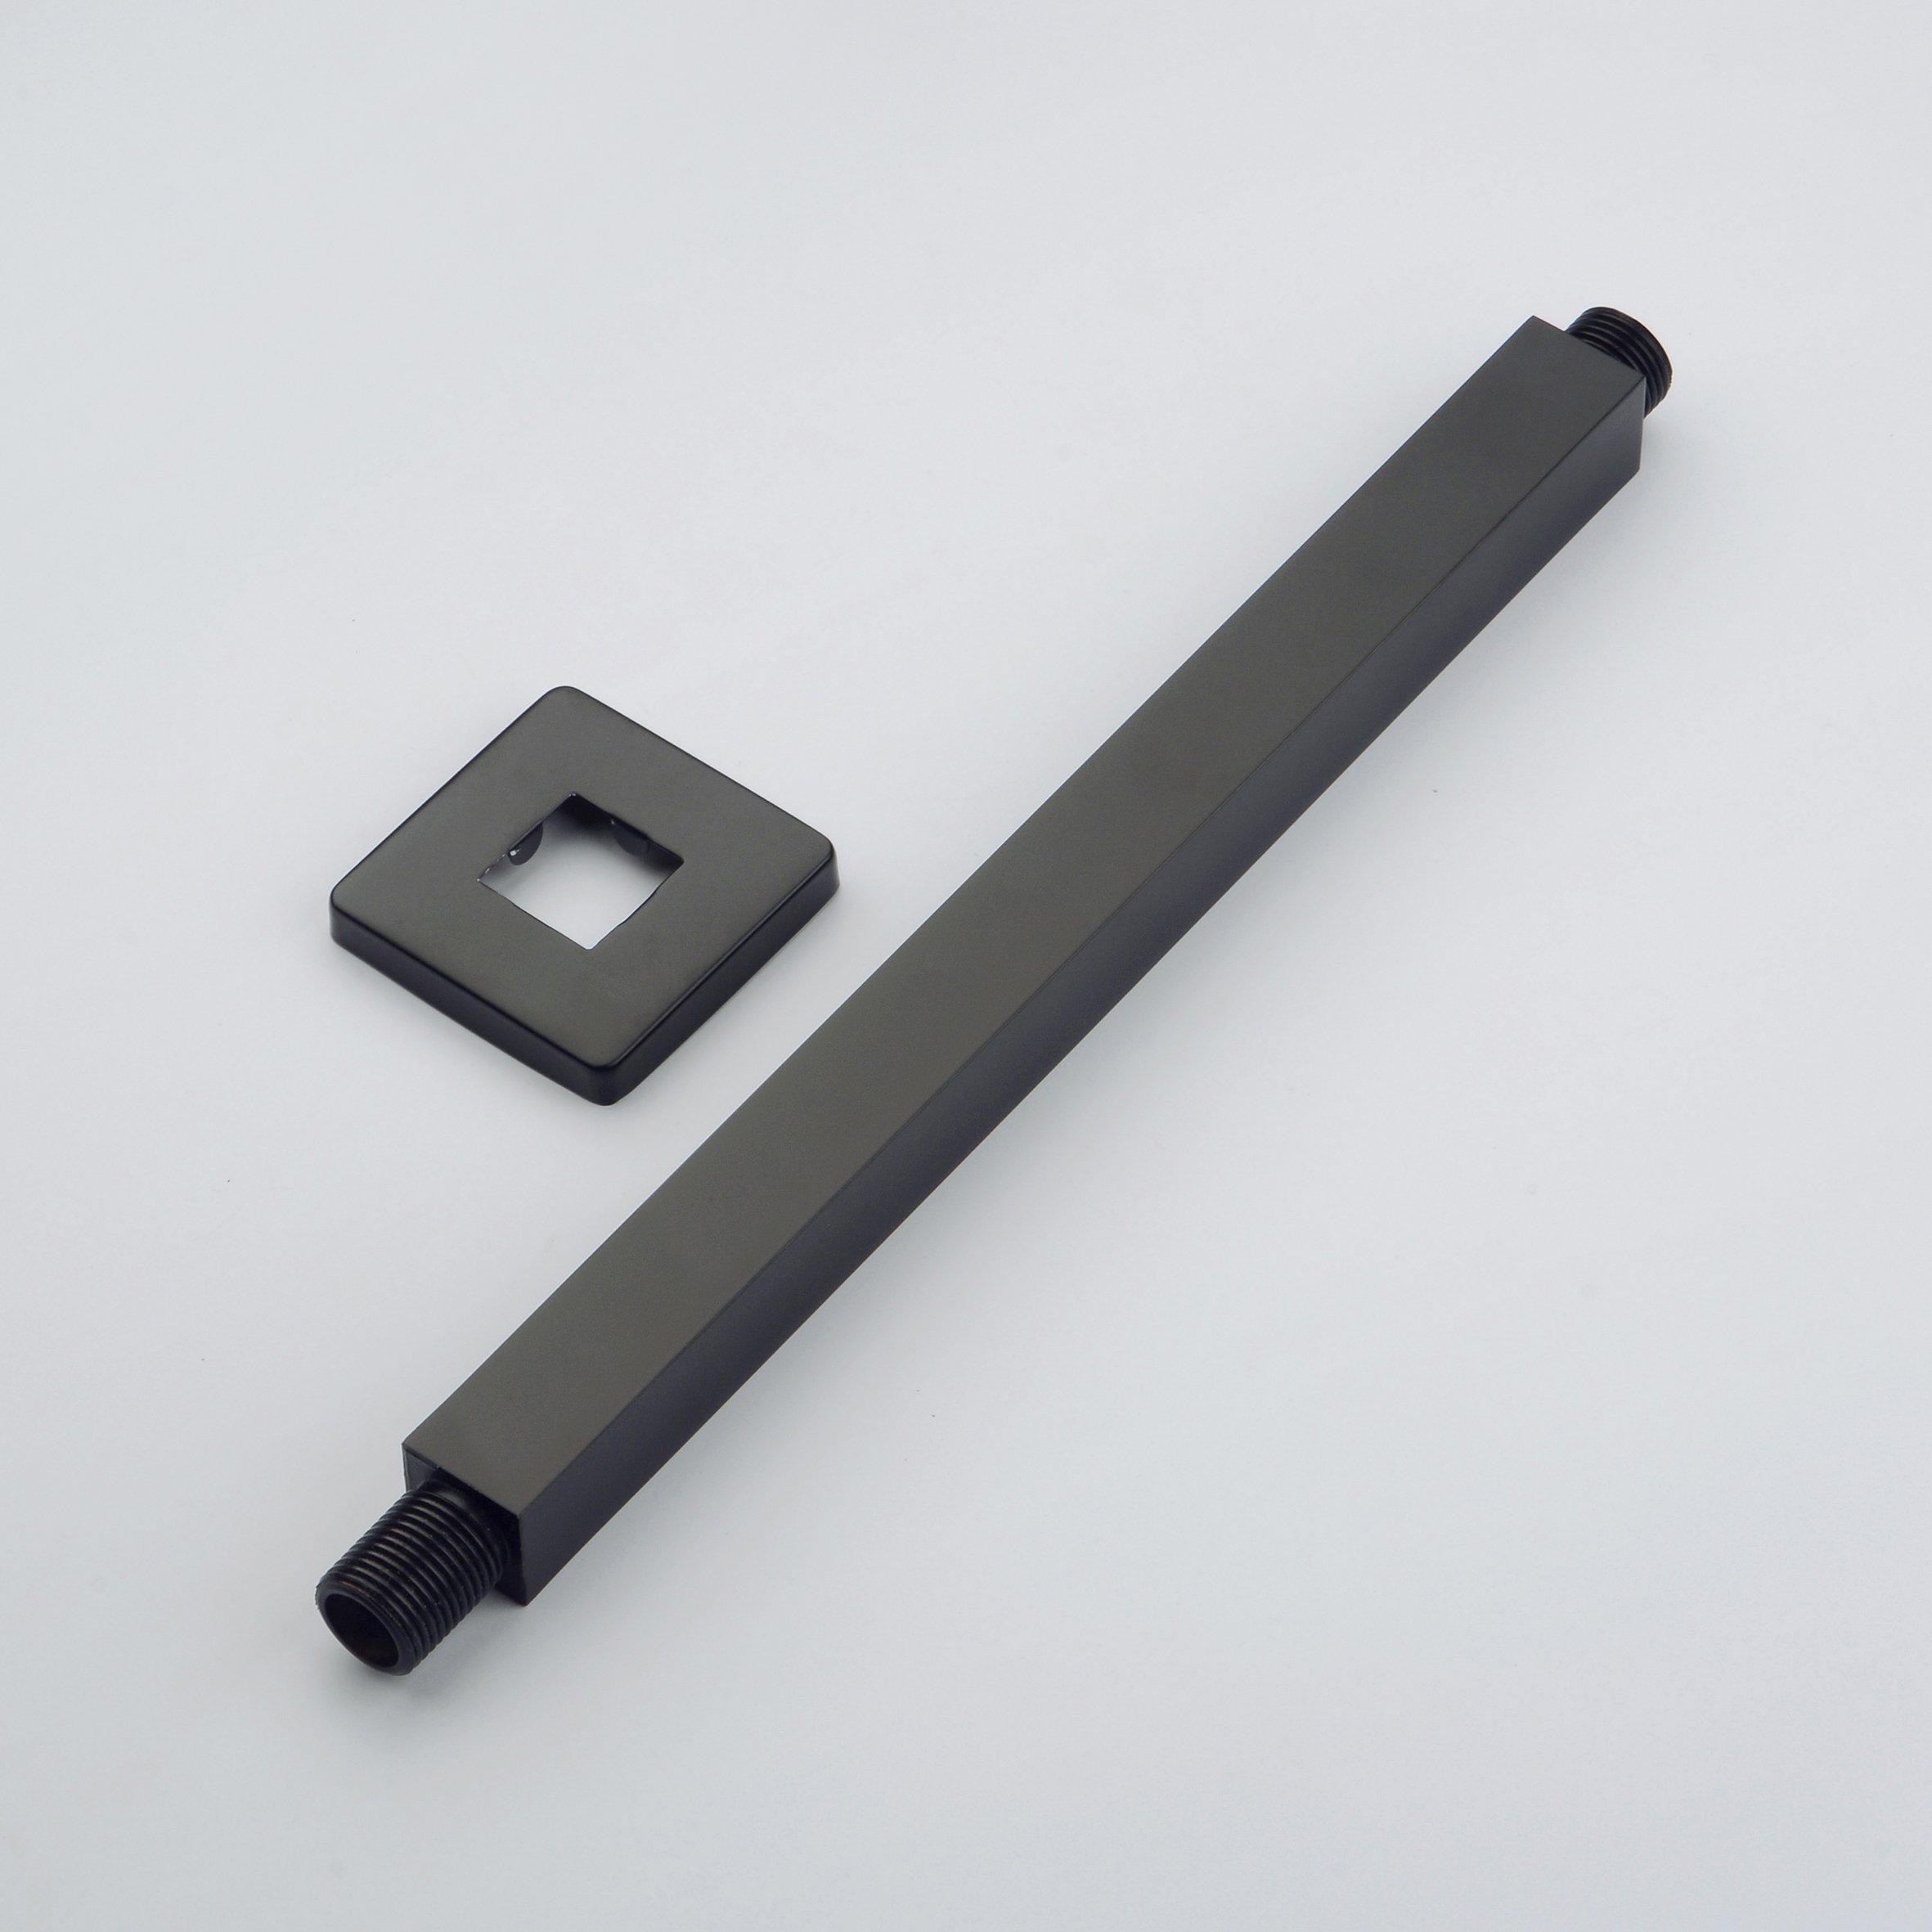 Hiendure 8-inch Ceiling Mount Shower Arm with 1/2-inch NPT Thread, Oil Rubbed Bronze